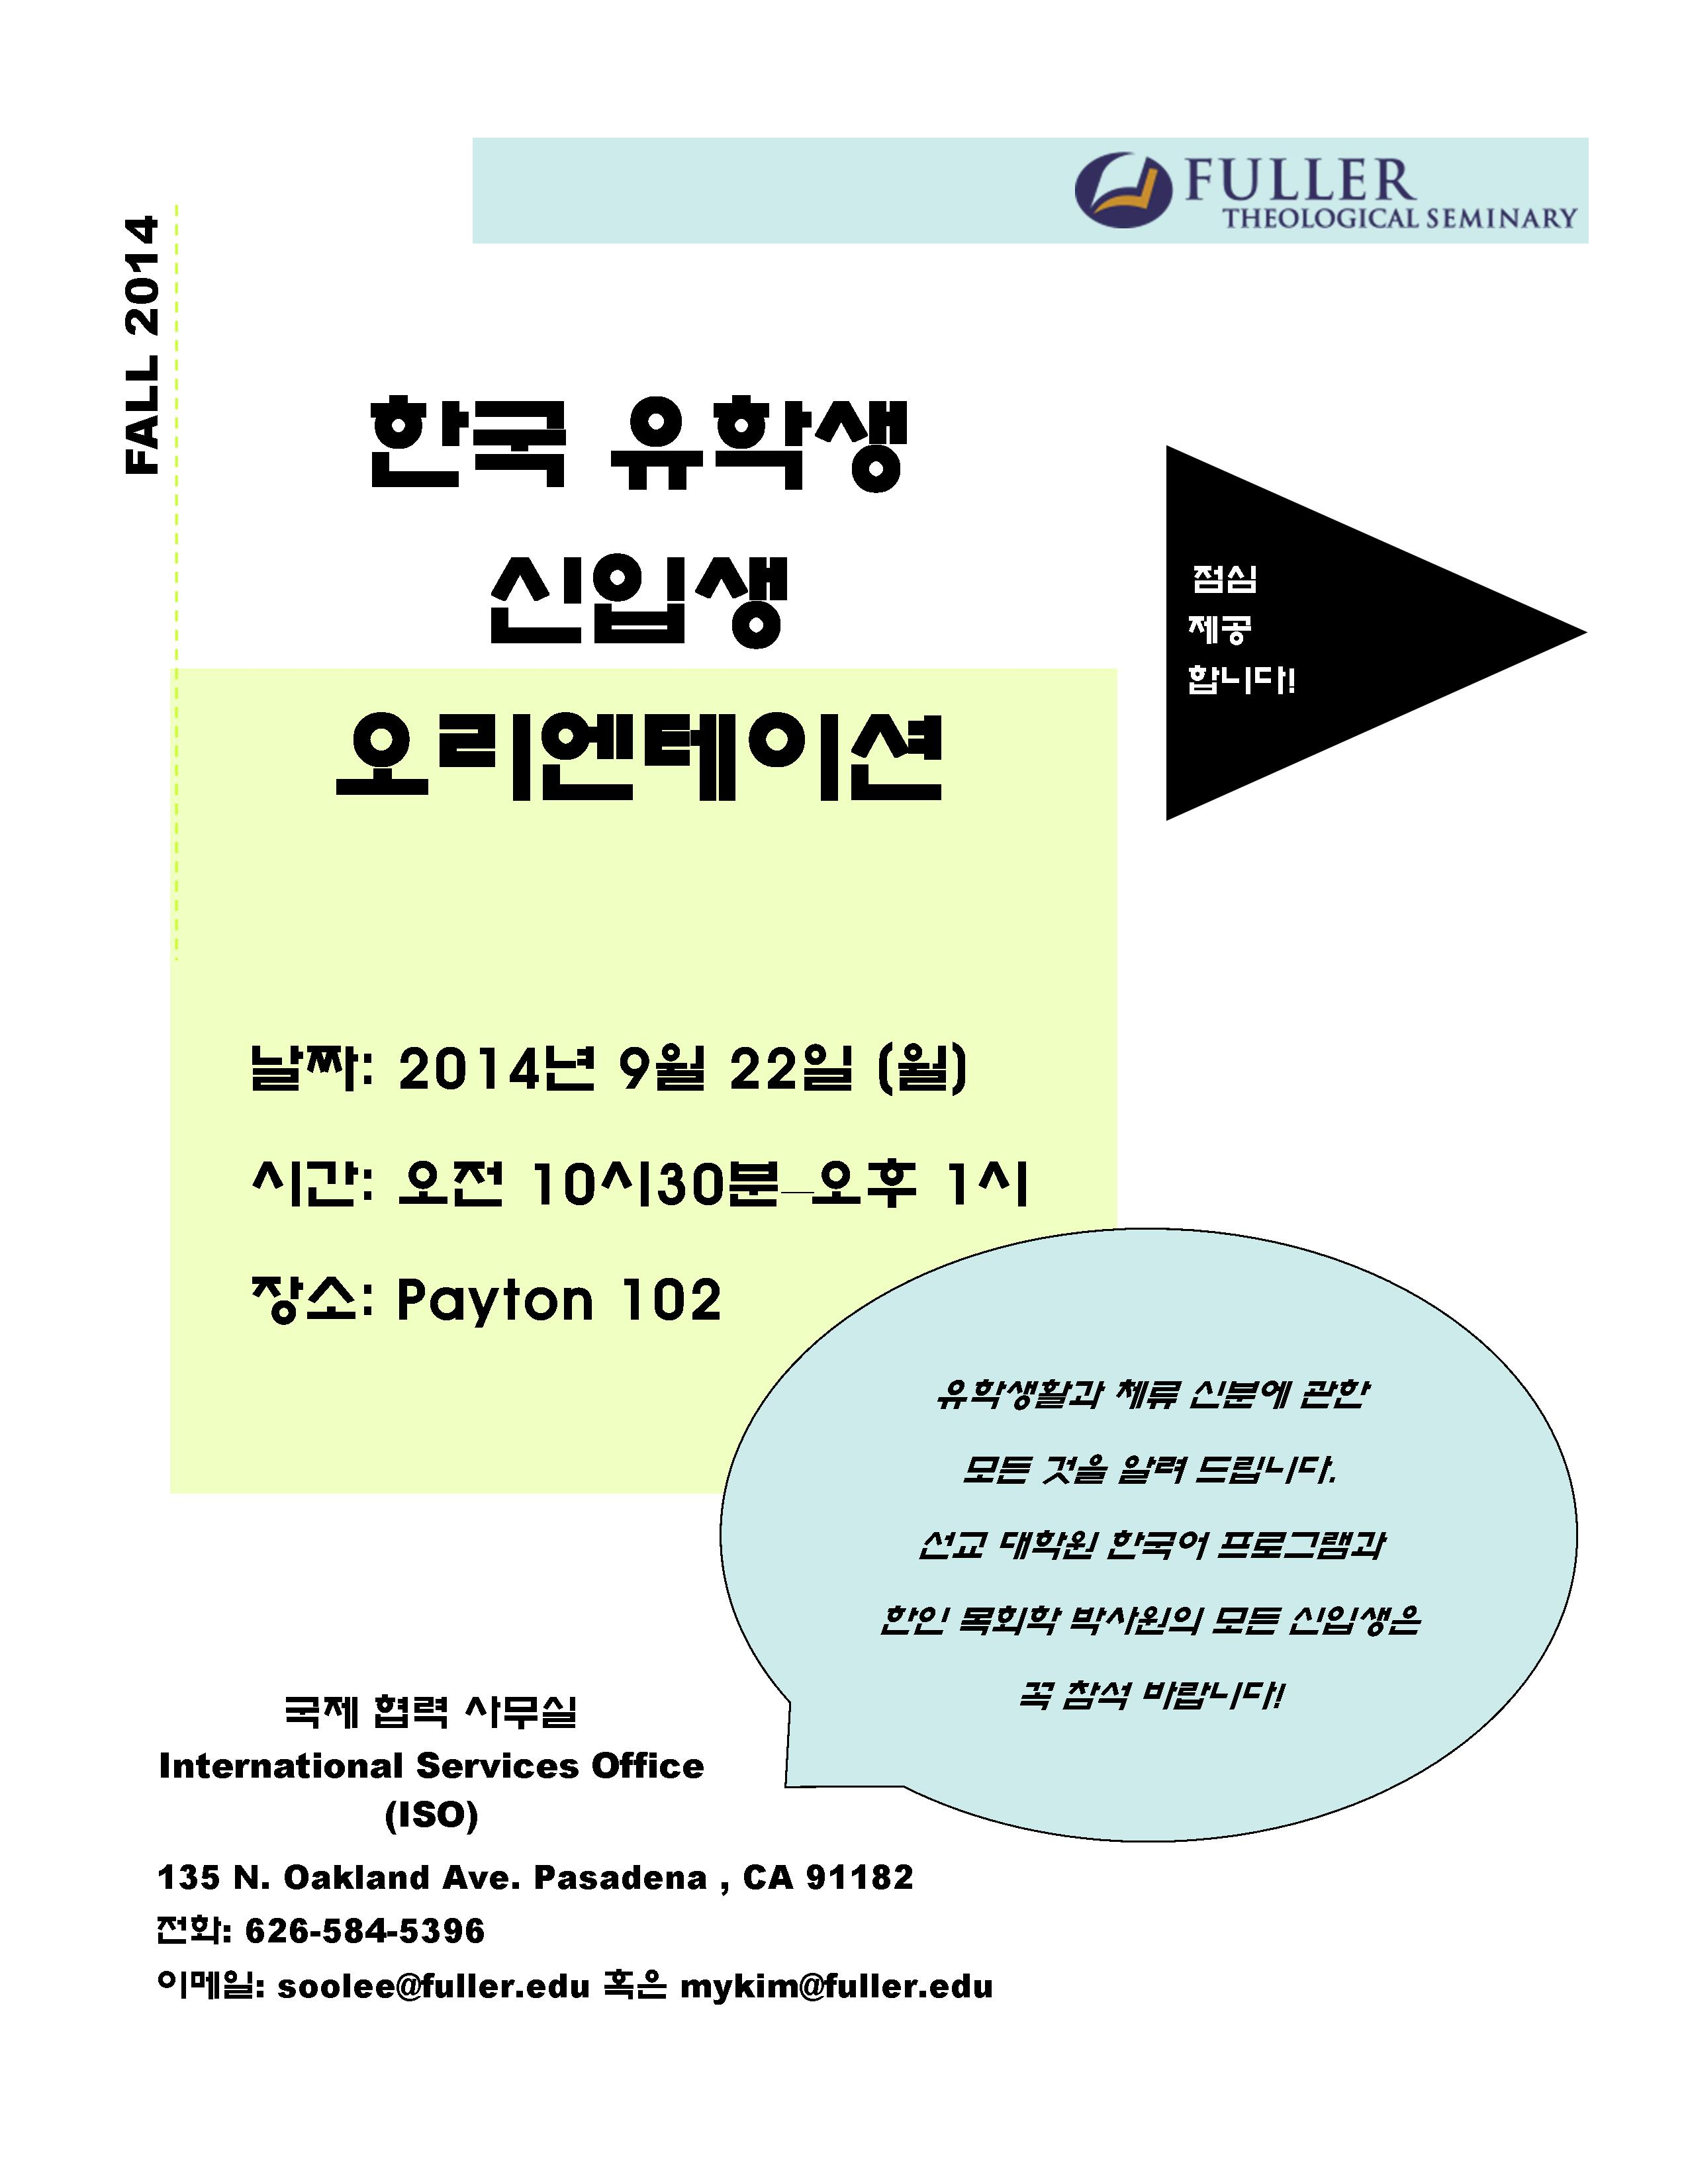 Korean orientation flyer 2014.jpg